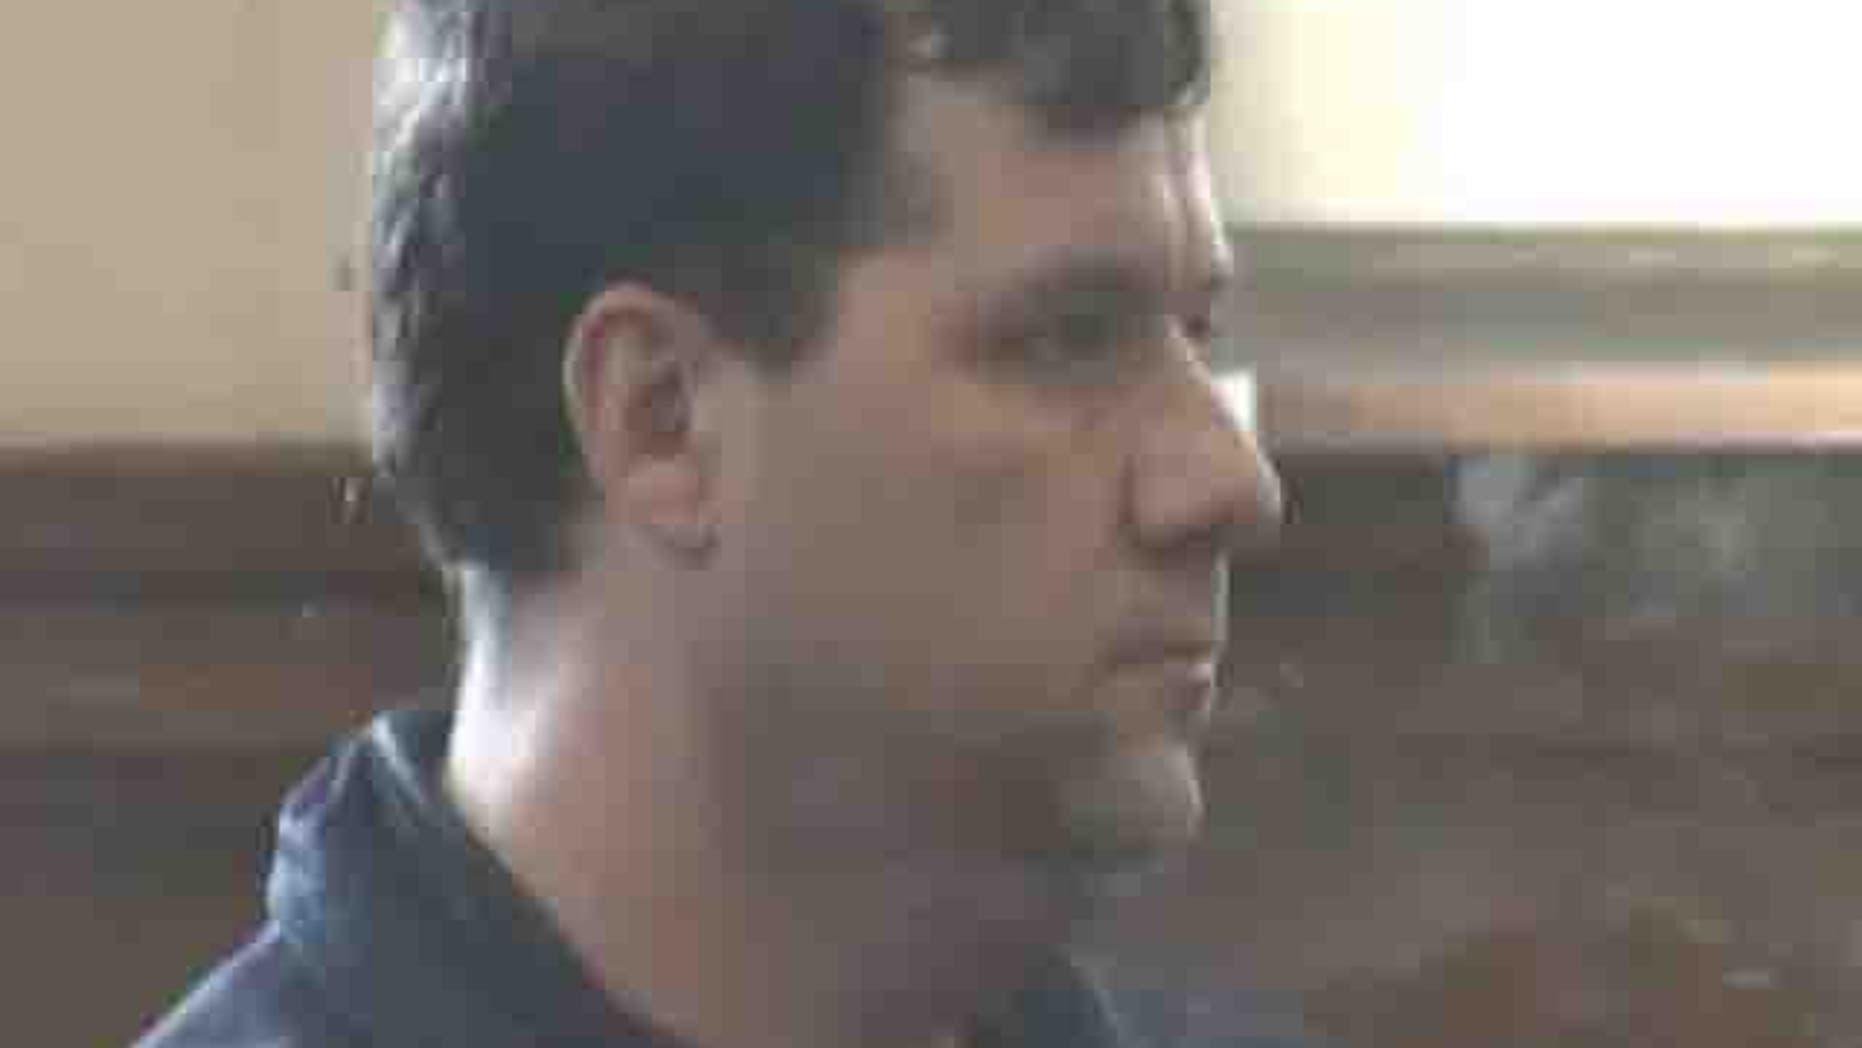 June 19, 2012: 37-year-old Erik K. Paulik appears in court.